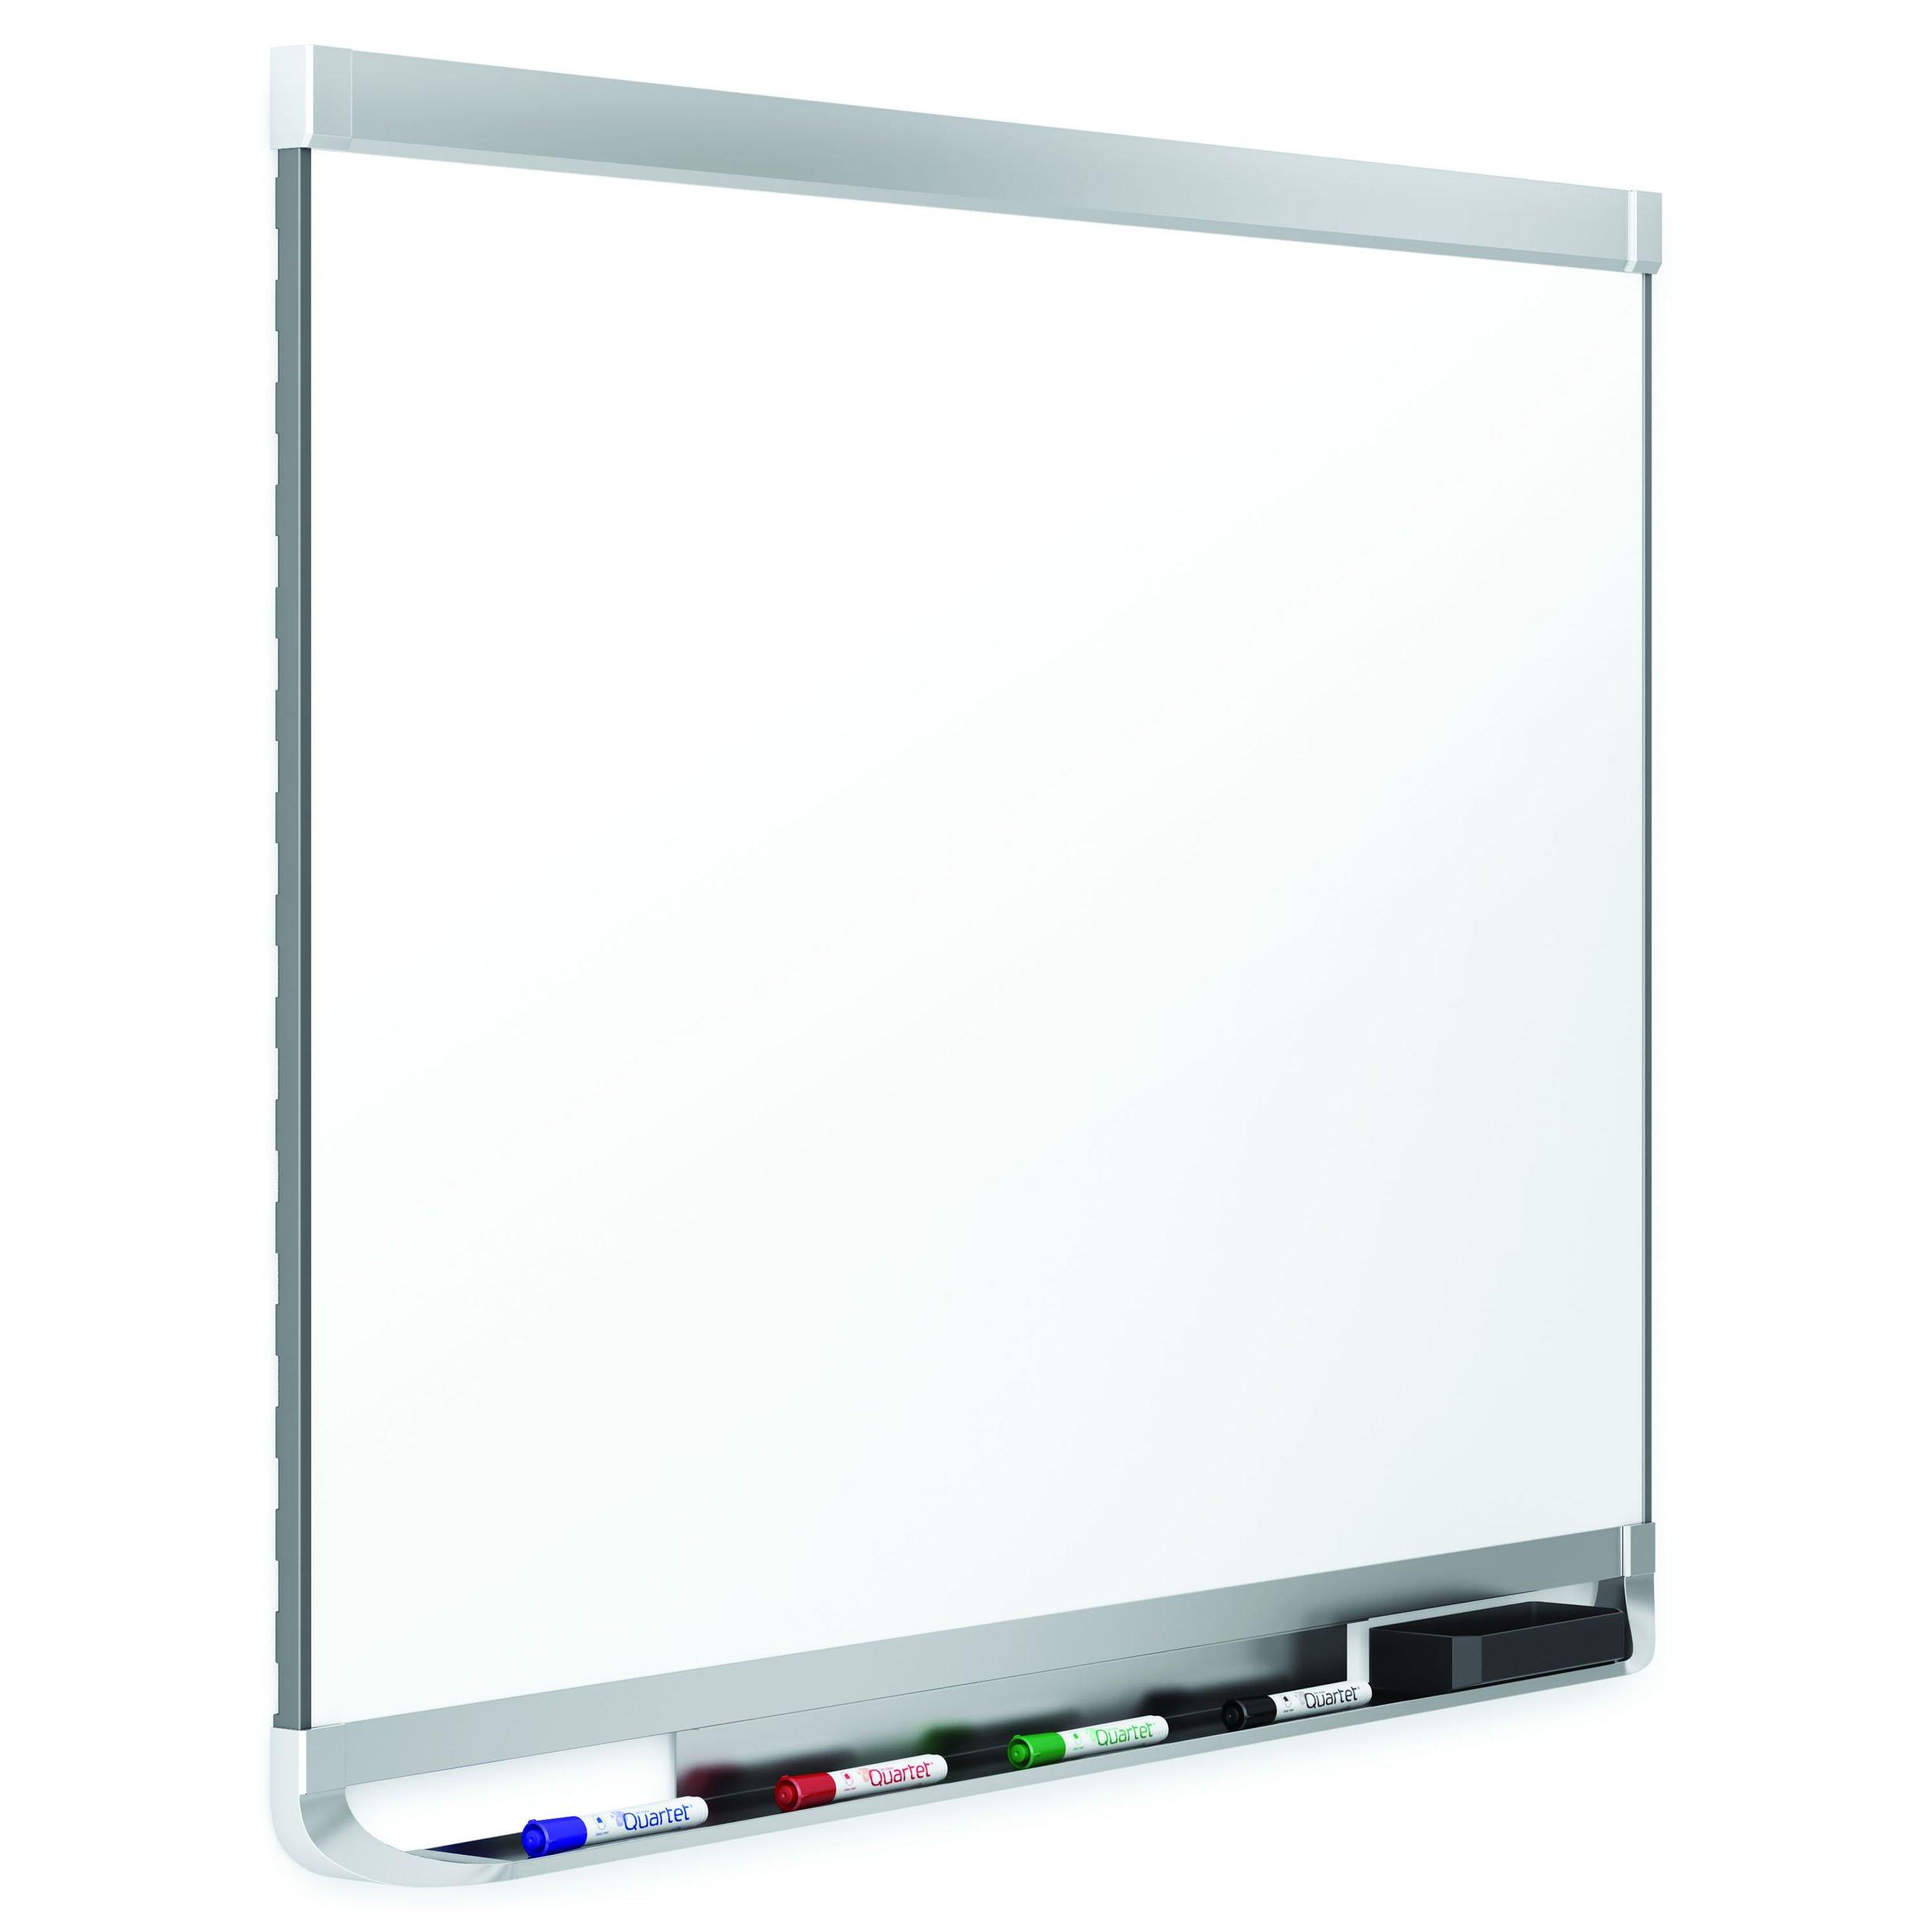 Quartet Prestige 2 DuraMax Porcelain Magnetic Whiteboard, 4 x 3 Feet, Aluminum Frame (P554AP2)